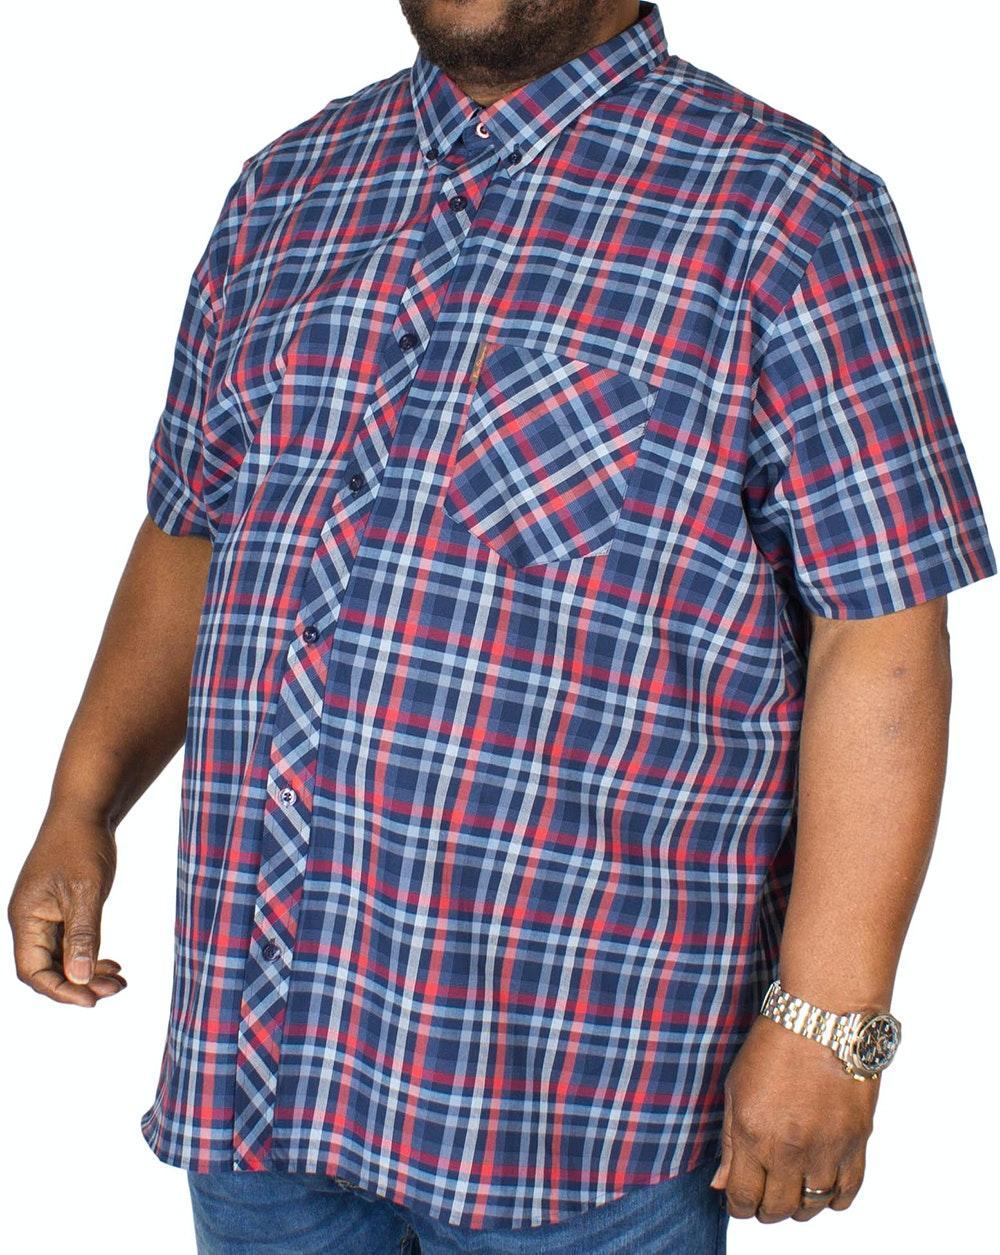 Ben Sherman Texture Check Shirt Navy